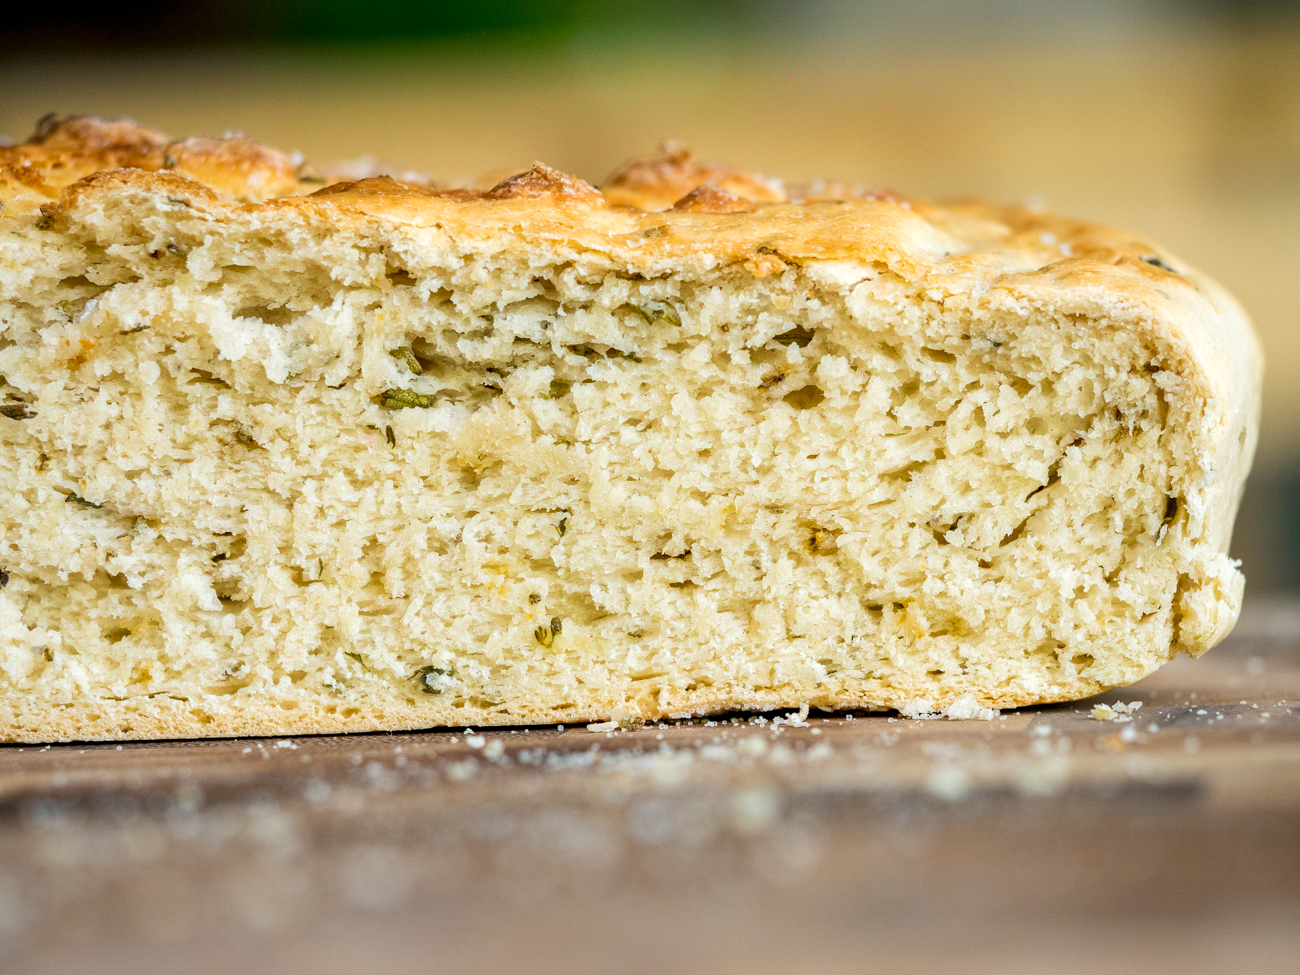 Slow Cooker Herb Bread Horizontal 10